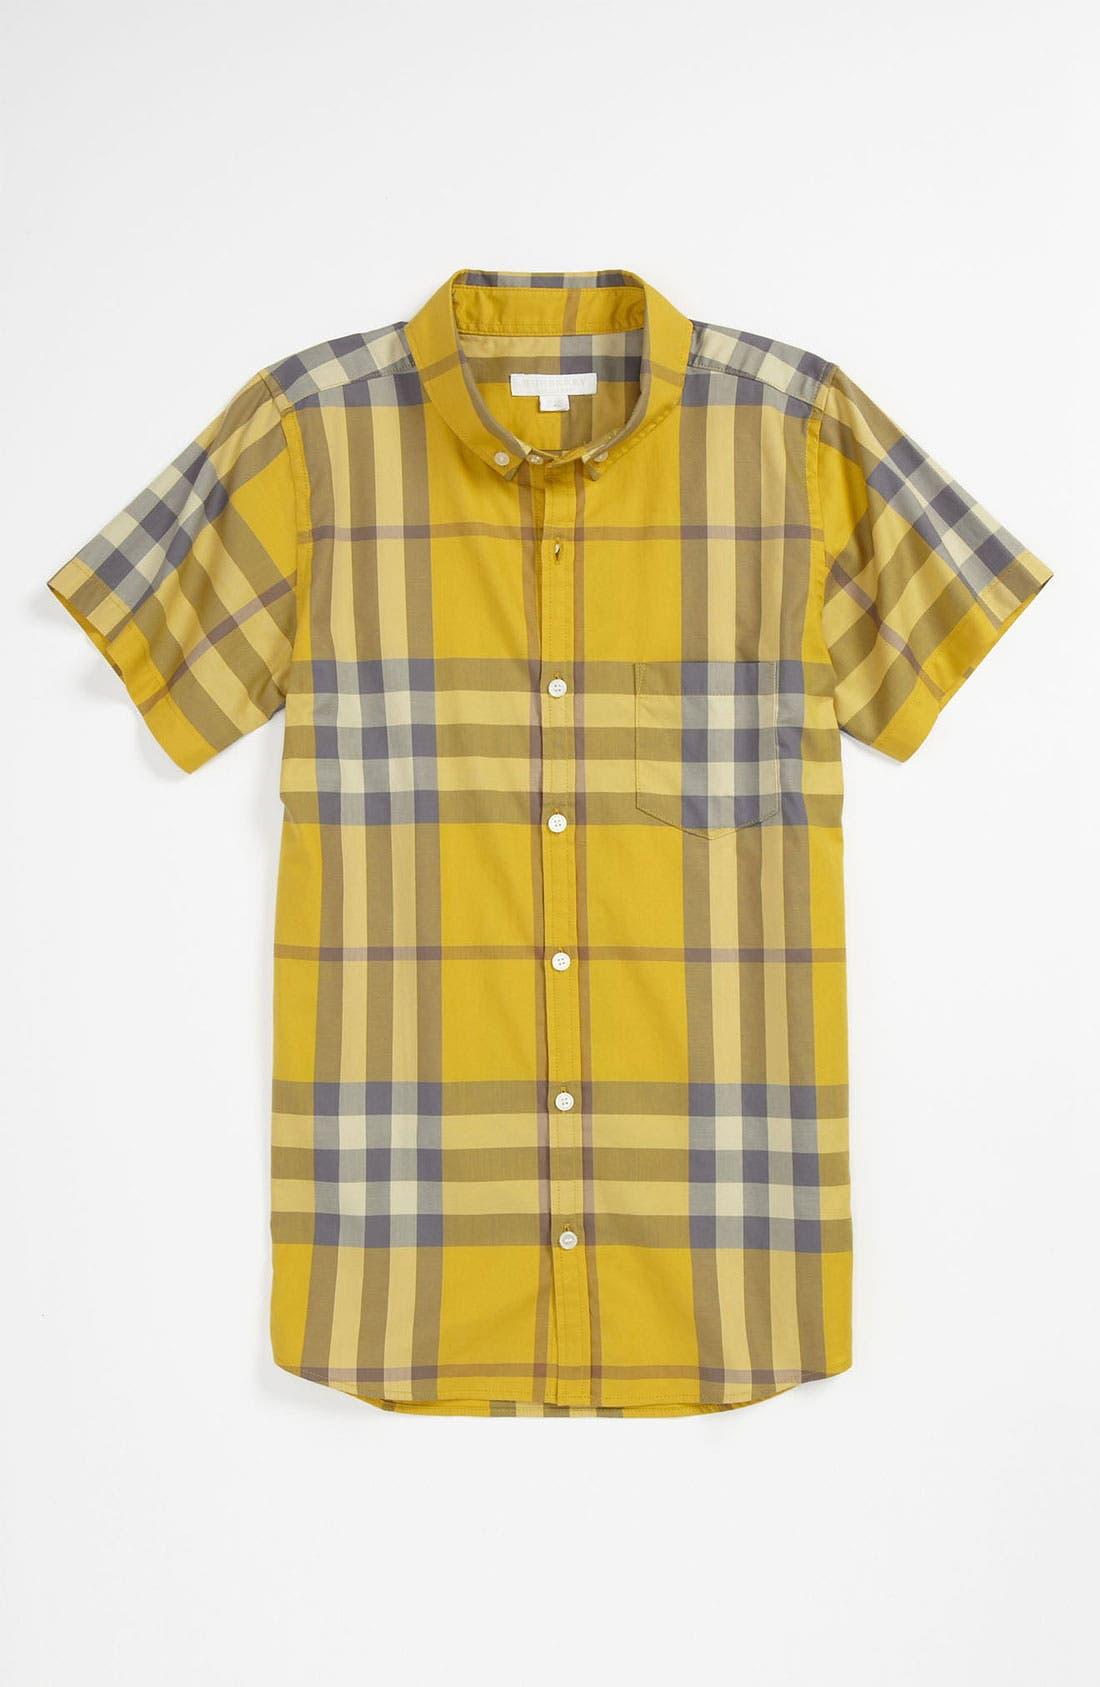 Alternate Image 1 Selected - Burberry 'Fred' Woven Shirt (Little Boys & Big Boys)